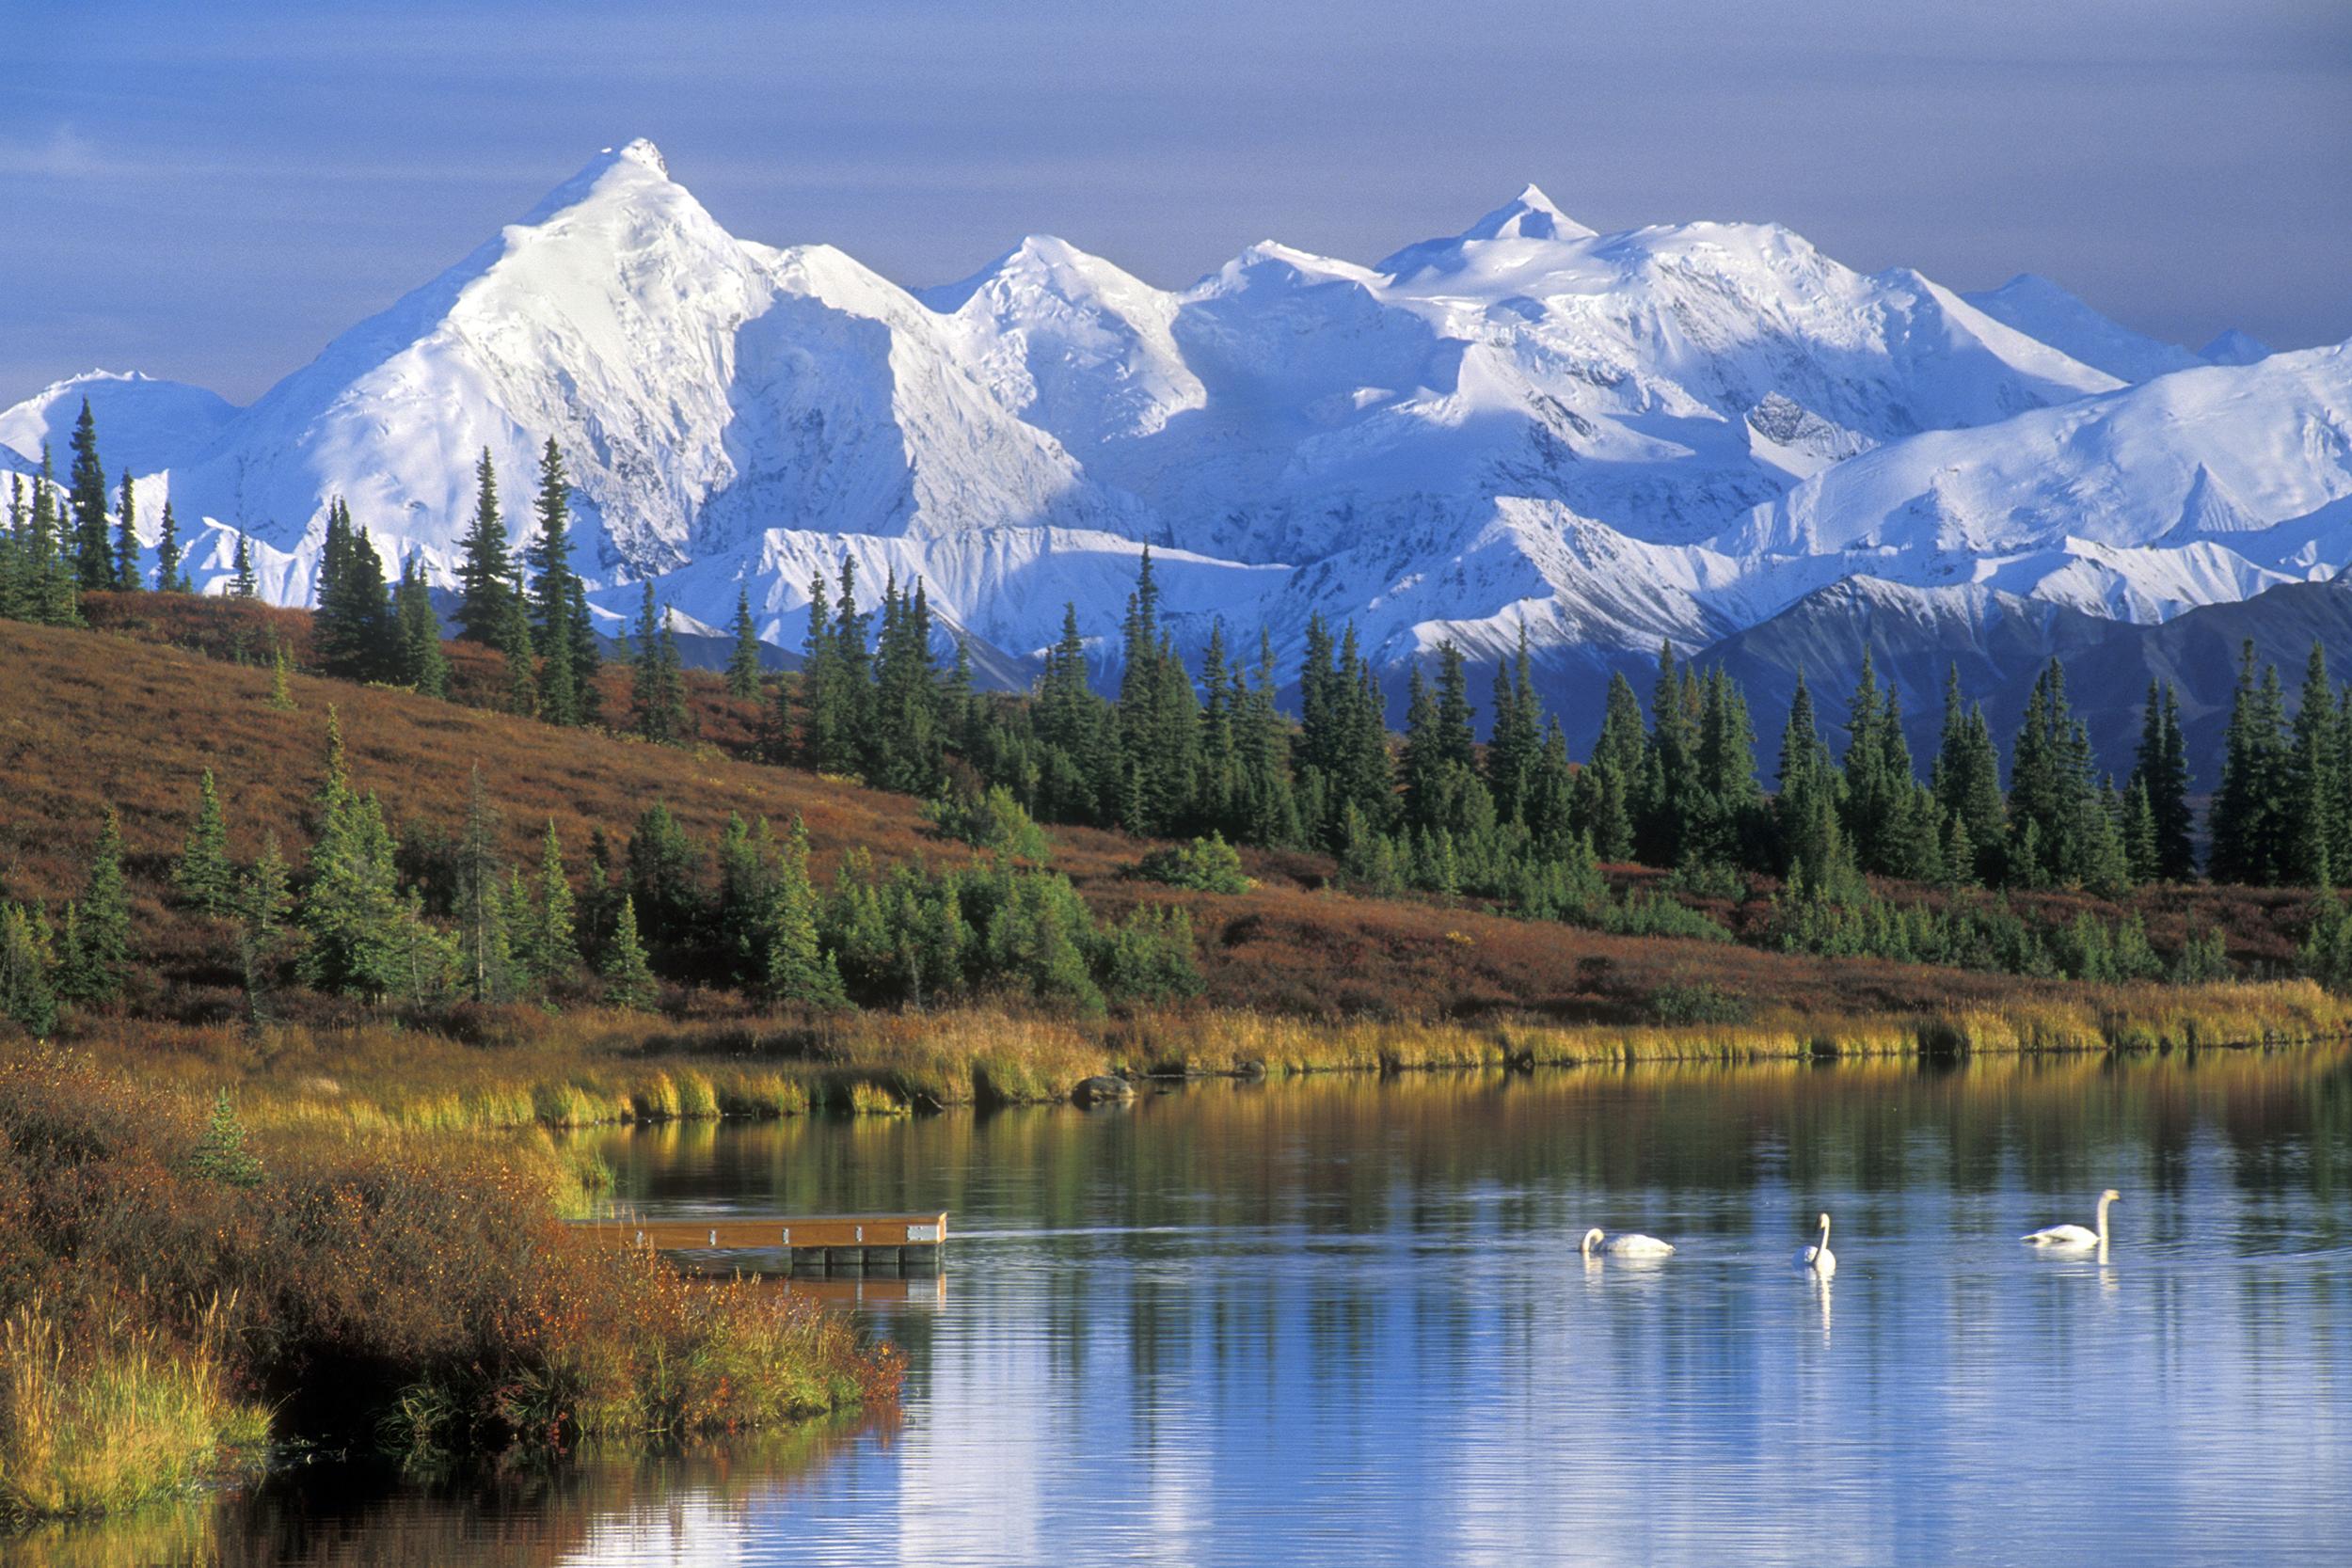 Hiker survives Alaska grizzly bear attack at Denali National Park